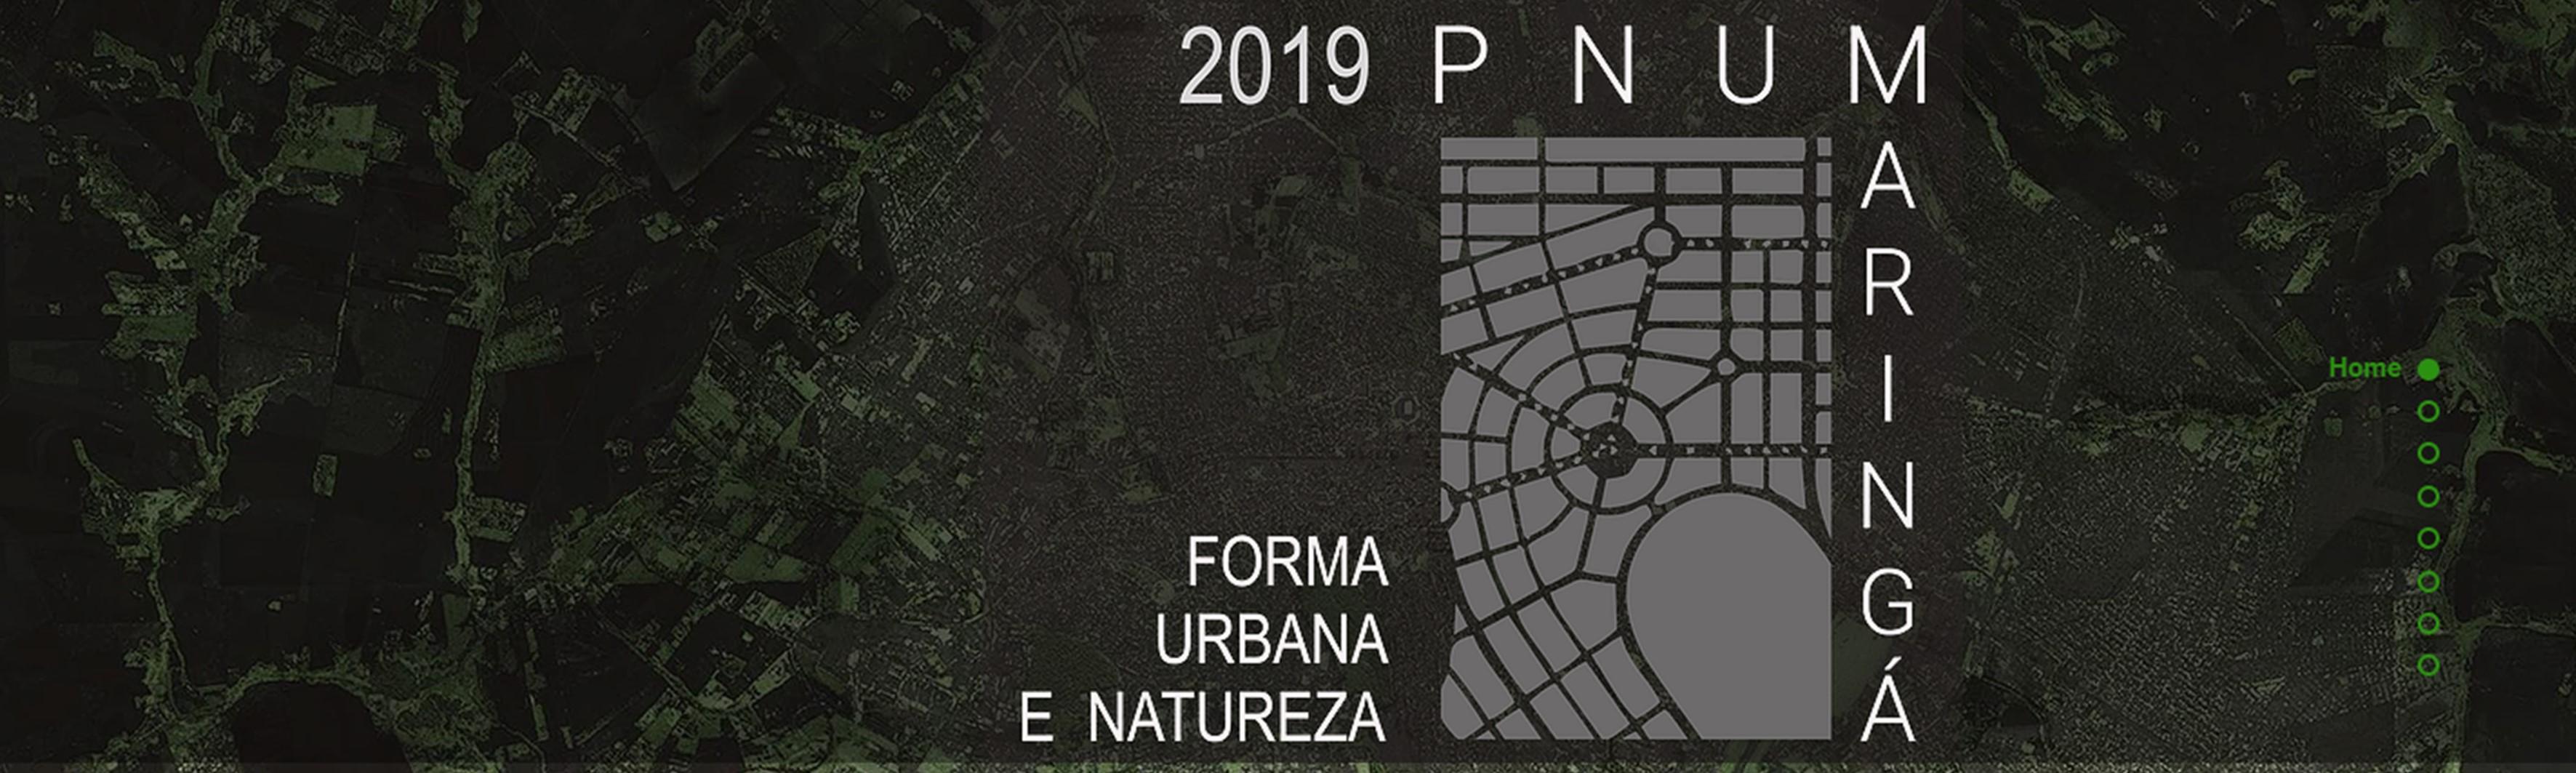 PNUM2019 website.jpg